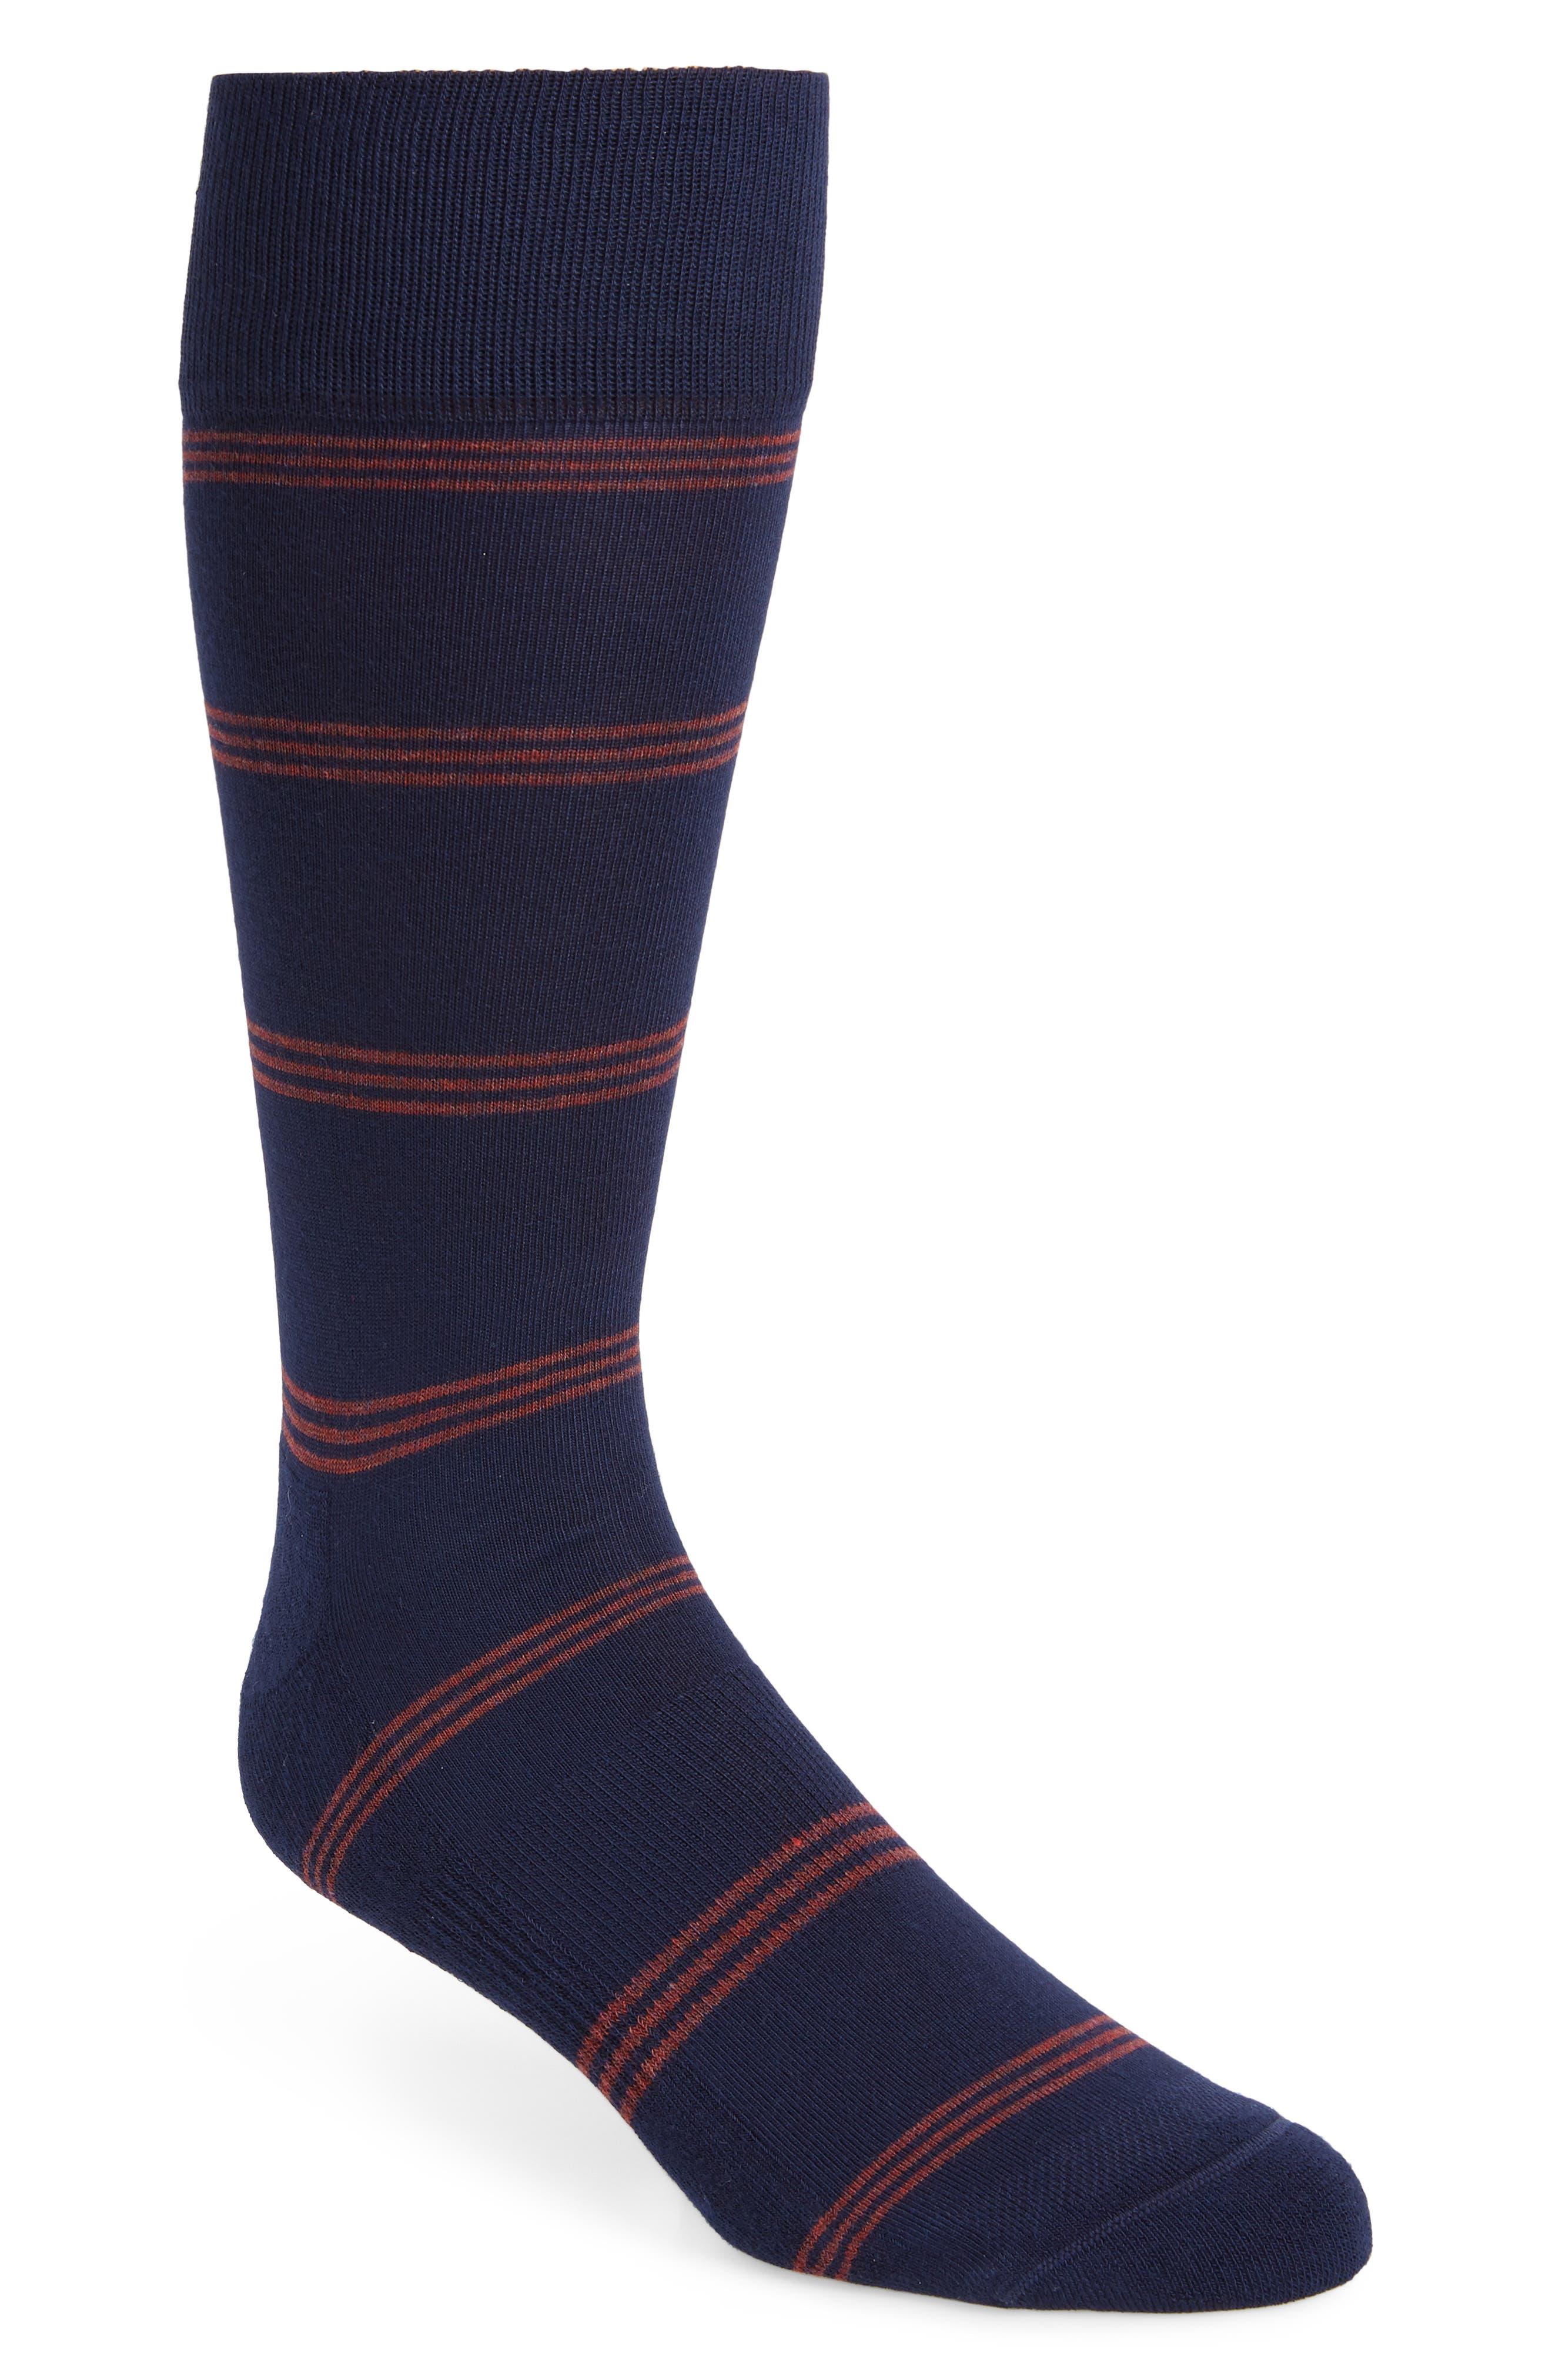 Triple Line Socks,                         Main,                         color, Navy/ Red